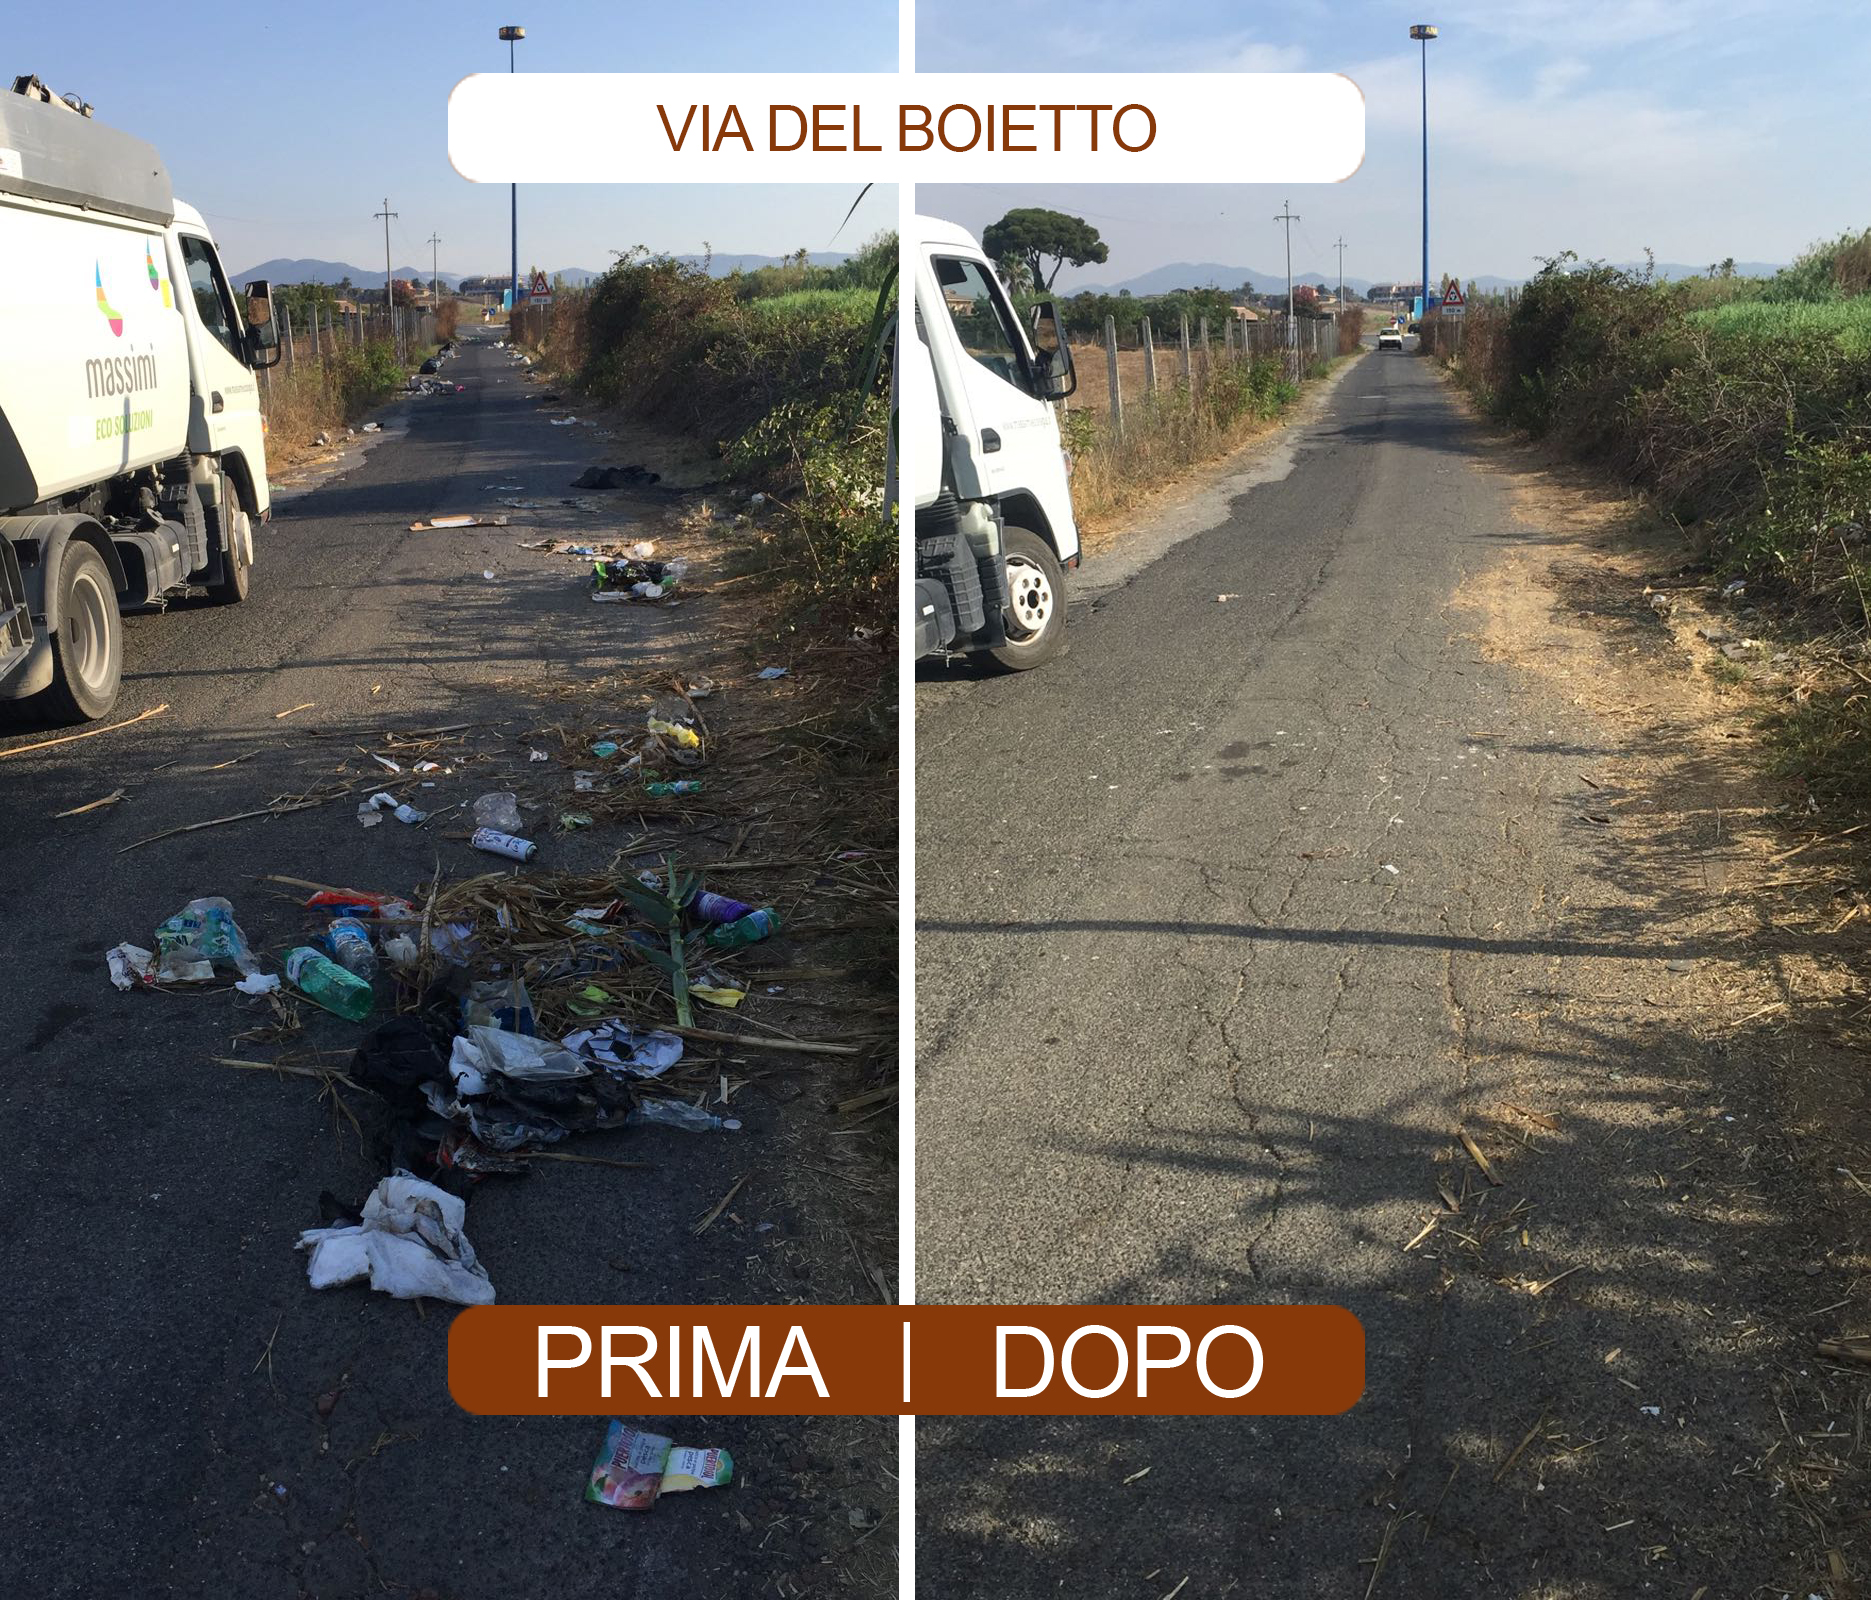 massimi-eco-soluzioni_segnala-rifiuto_prima_dopo